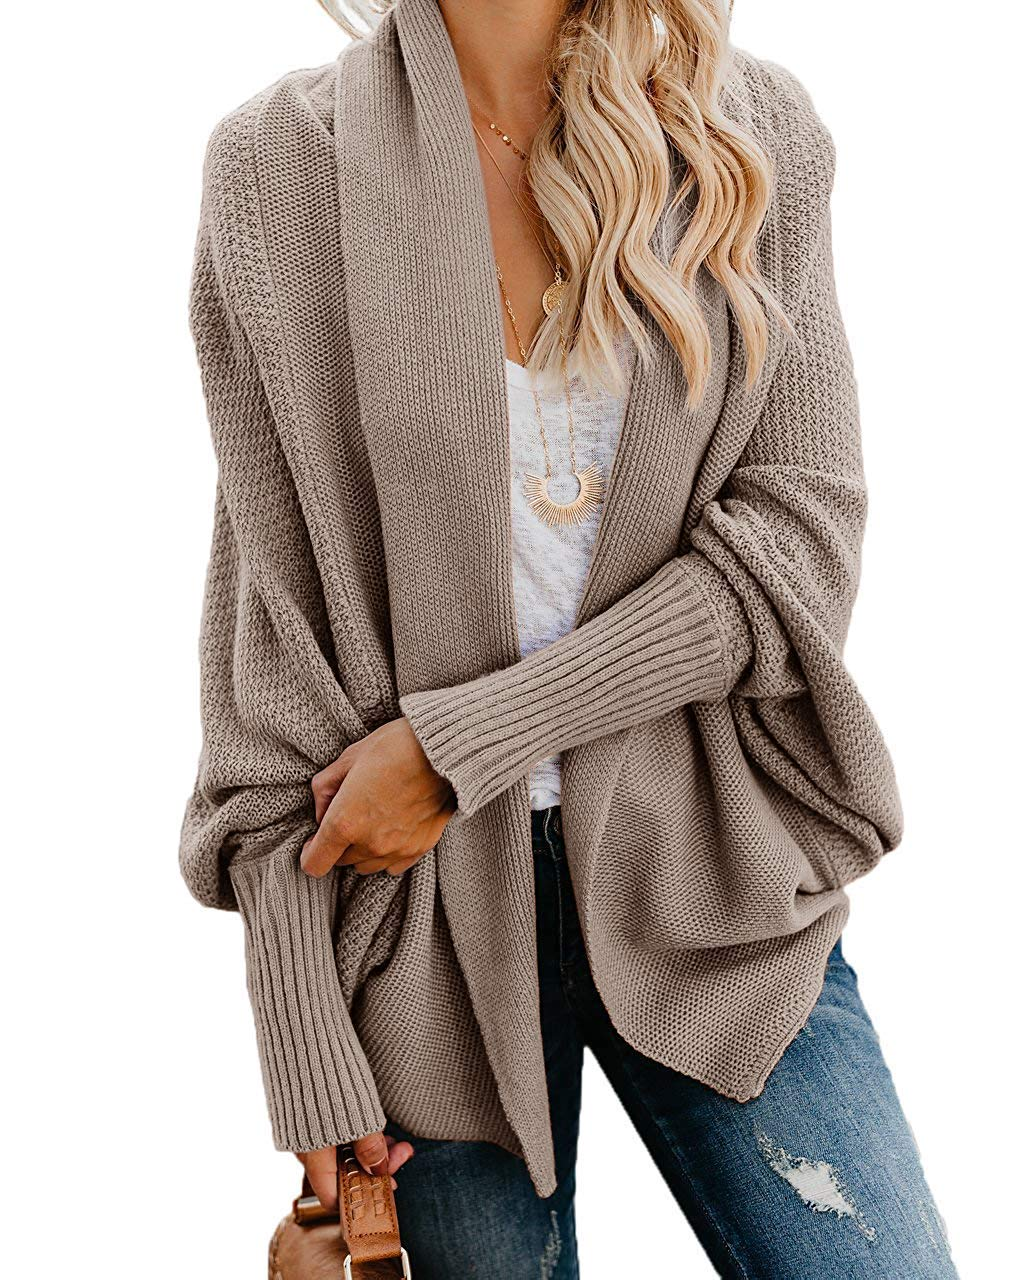 FIRENGOLI Saralove Womens Kimono Open Front Cardigan Sweaters Batwing Sleeve Shawl Collared Oversized Sweater Cloak Outwear (Khaki,Medium)